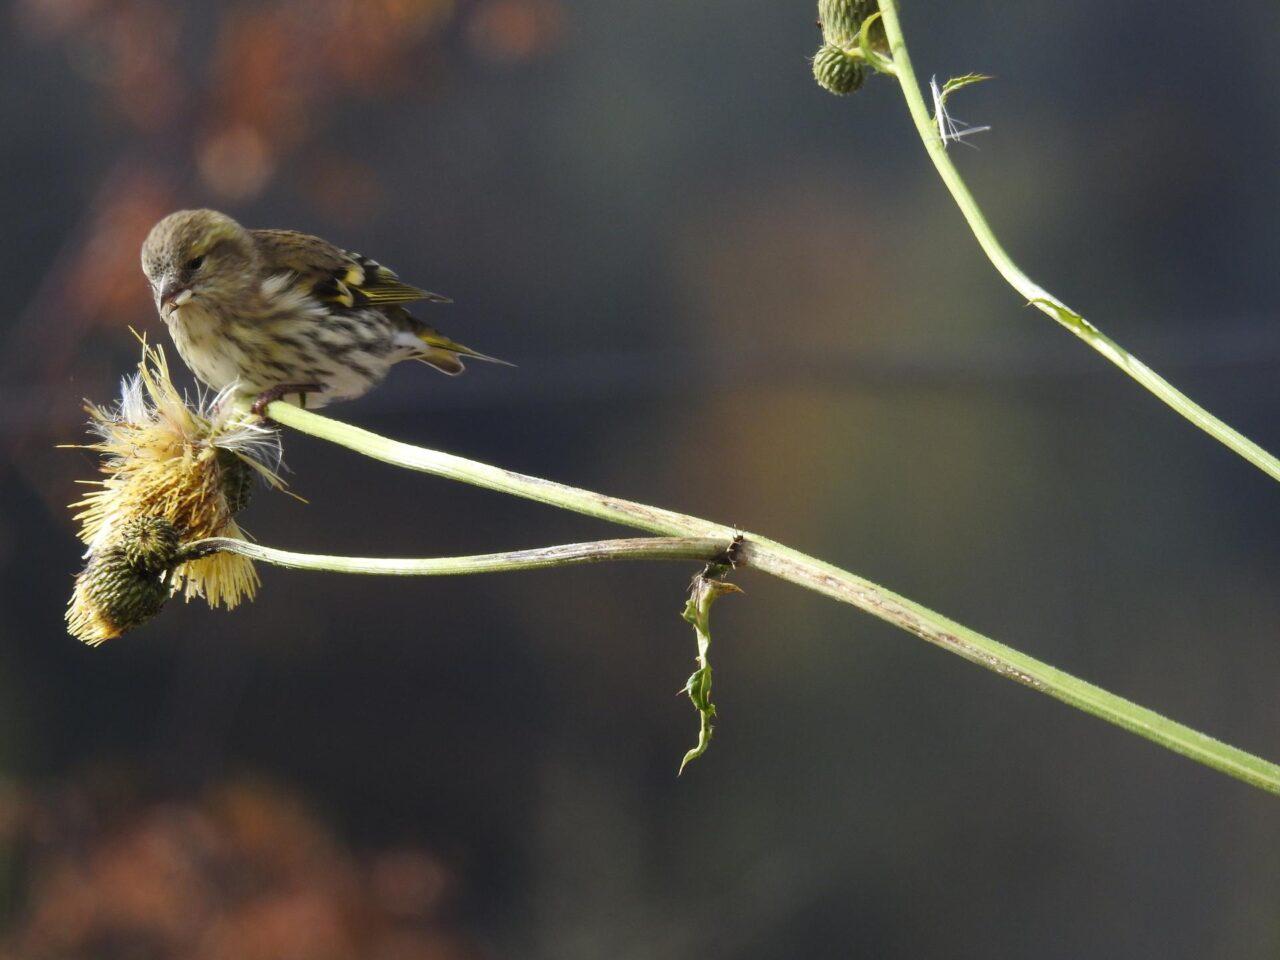 anellamento uccelli ledro muse lucherino femmina PP MUSE